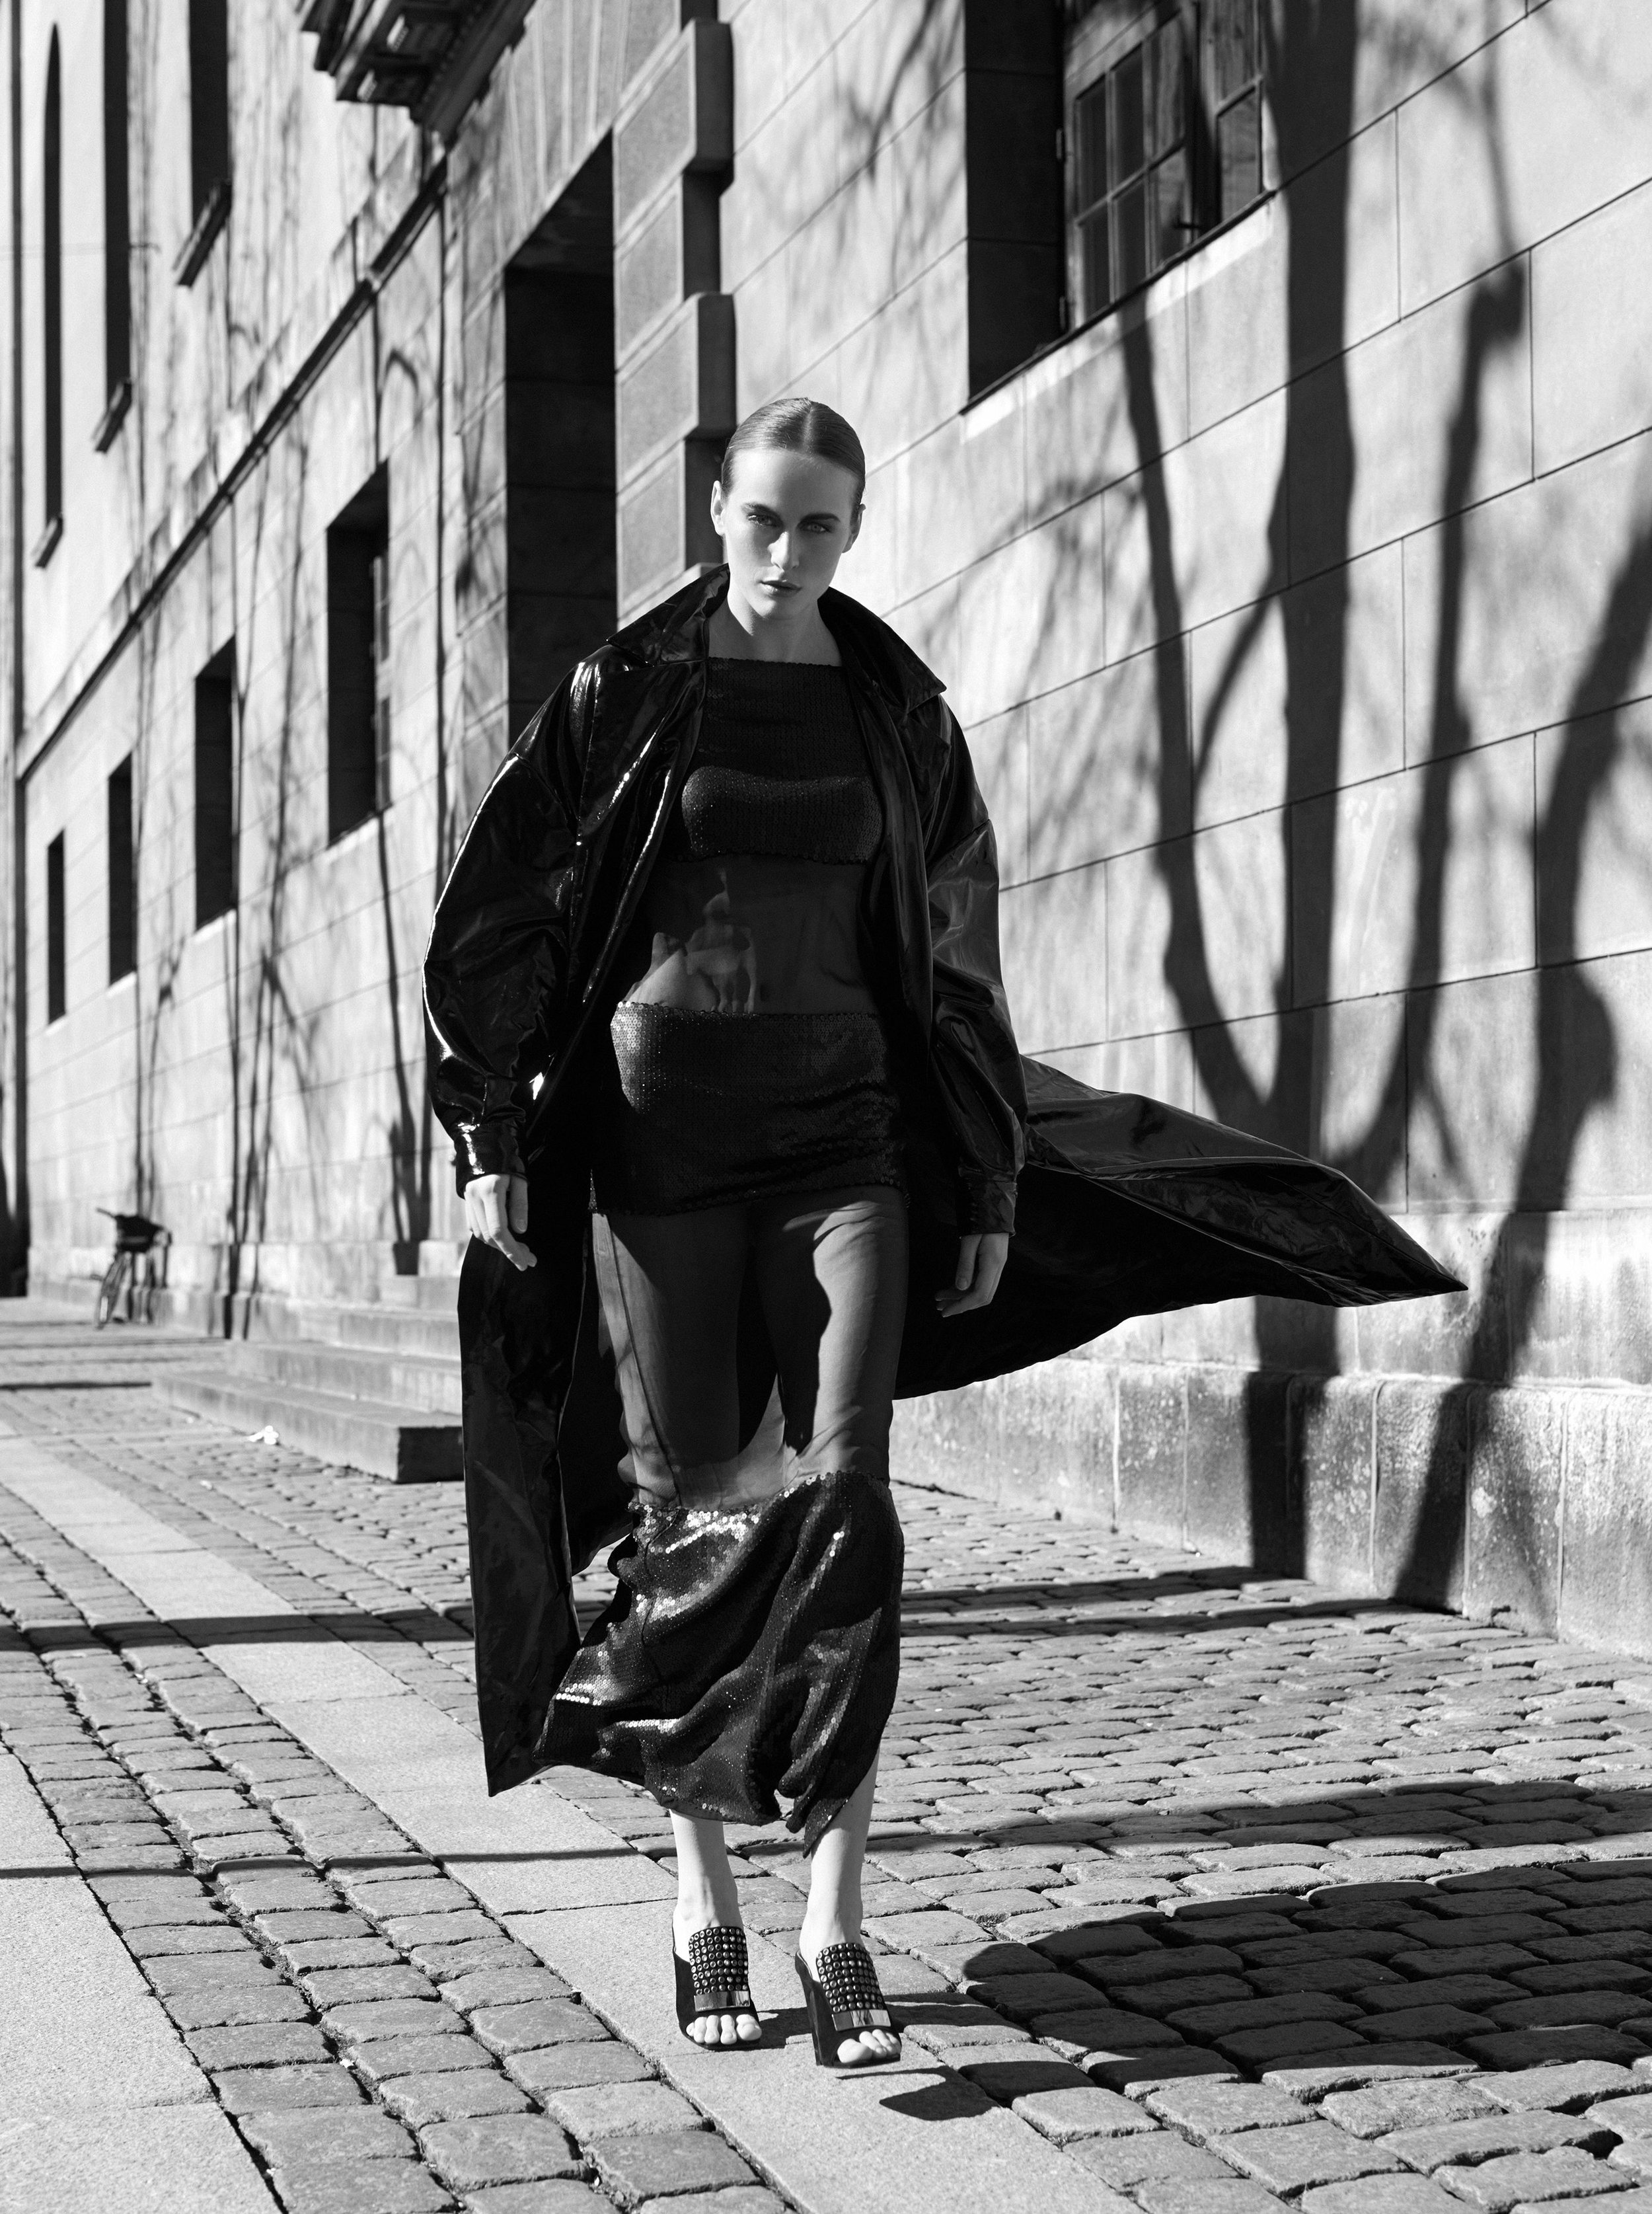 dress  Guy Laroche  coat  Gin Salemò  shoes  Sergio Rossi